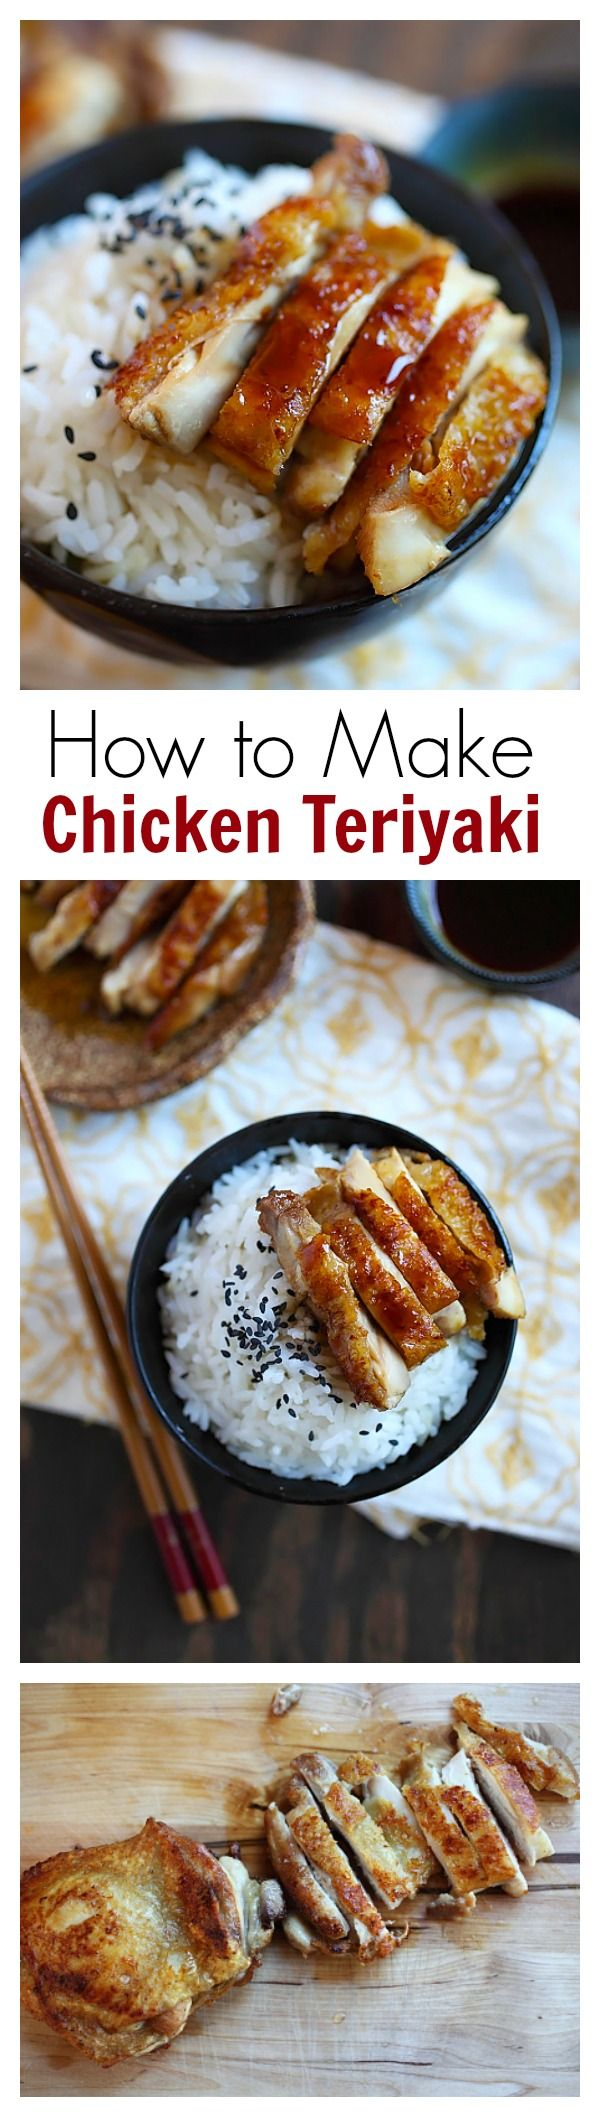 How to make chicken teriyaki? EASY recipe for teriyaki sauce plus chicken teriyaki that tastes like Japanese restaurants | rasamalaysia.com